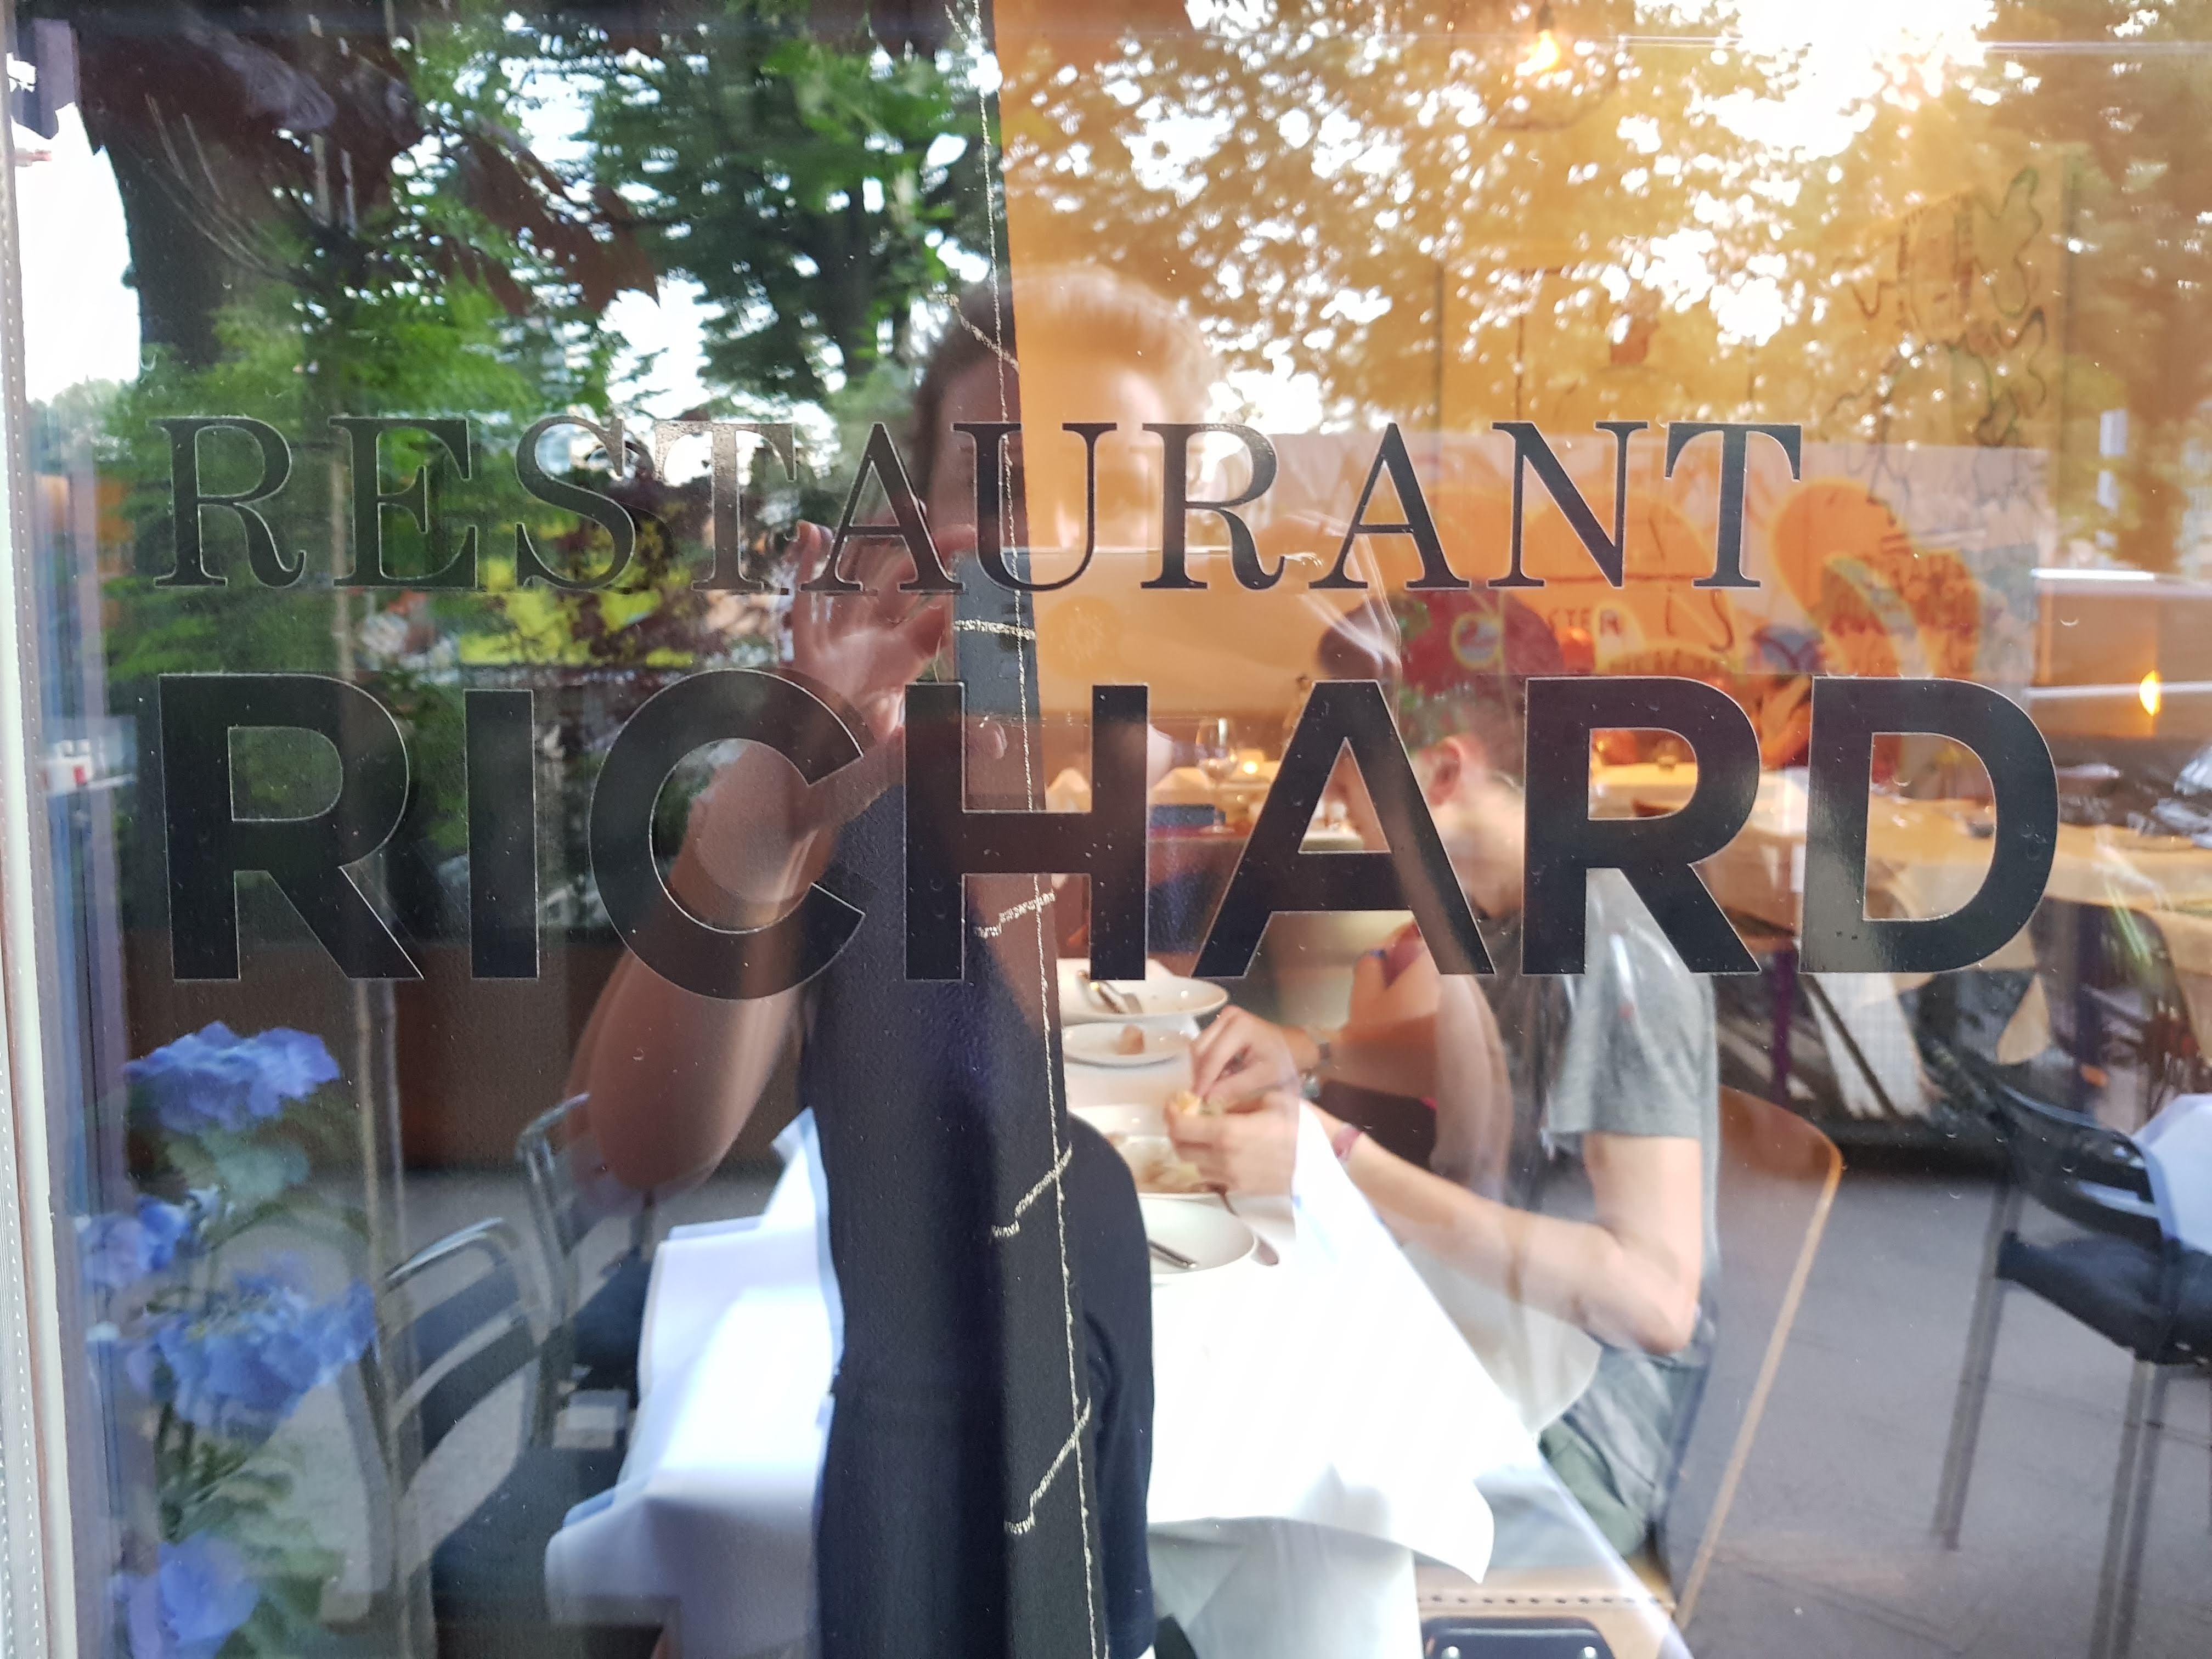 Richard, Berlin